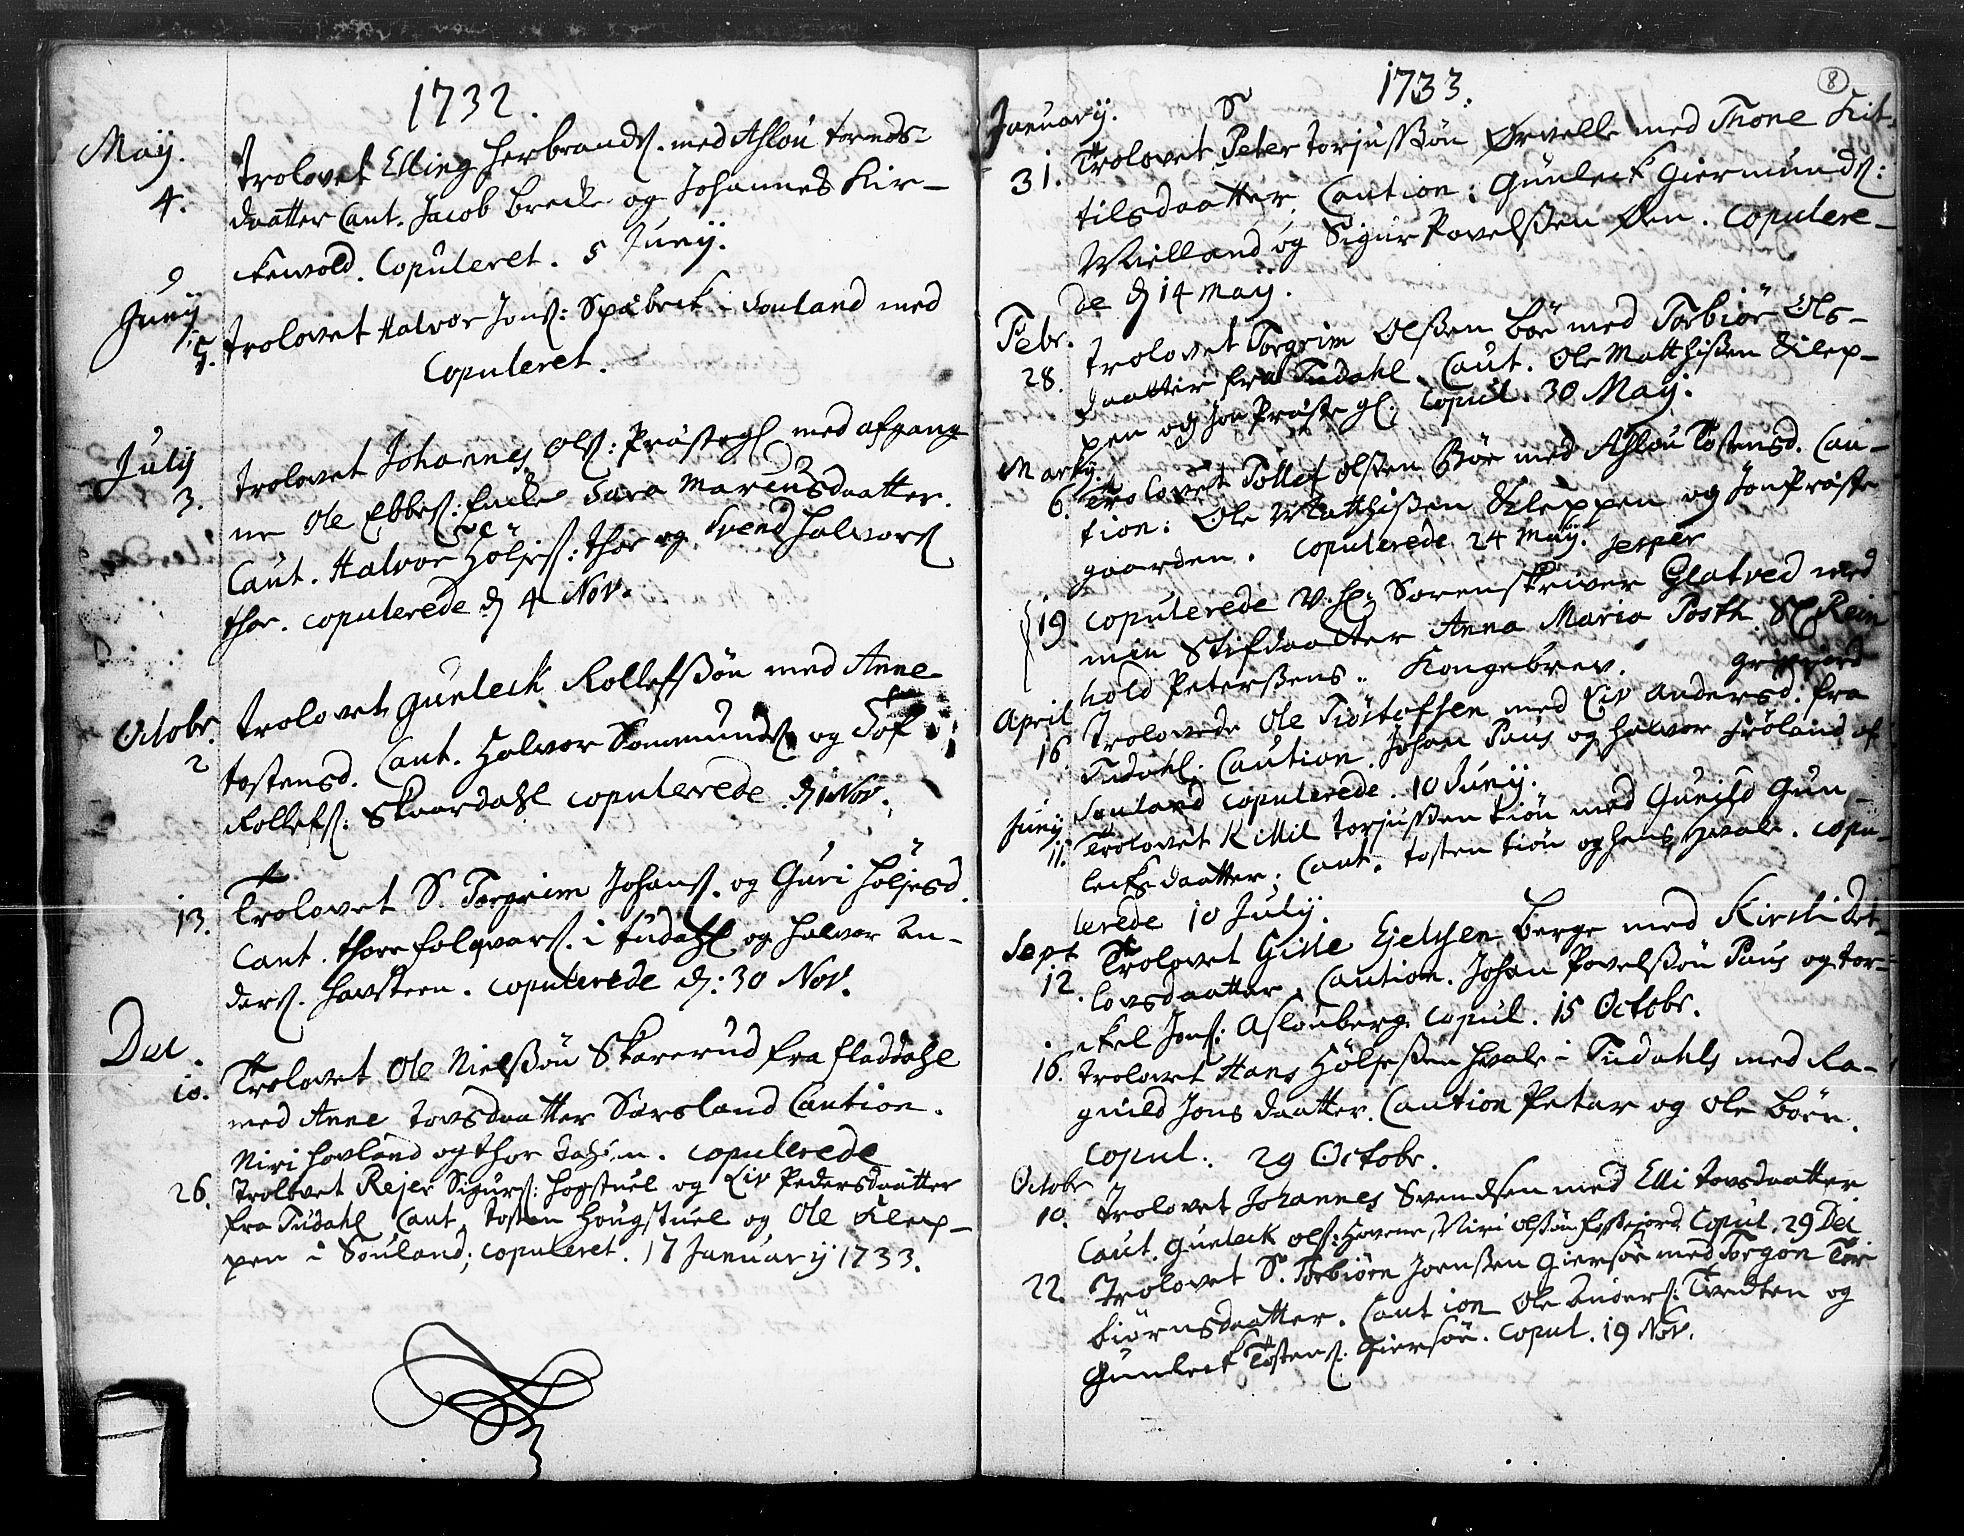 SAKO, Hjartdal kirkebøker, F/Fa/L0004: Ministerialbok nr. I 4, 1727-1795, s. 8